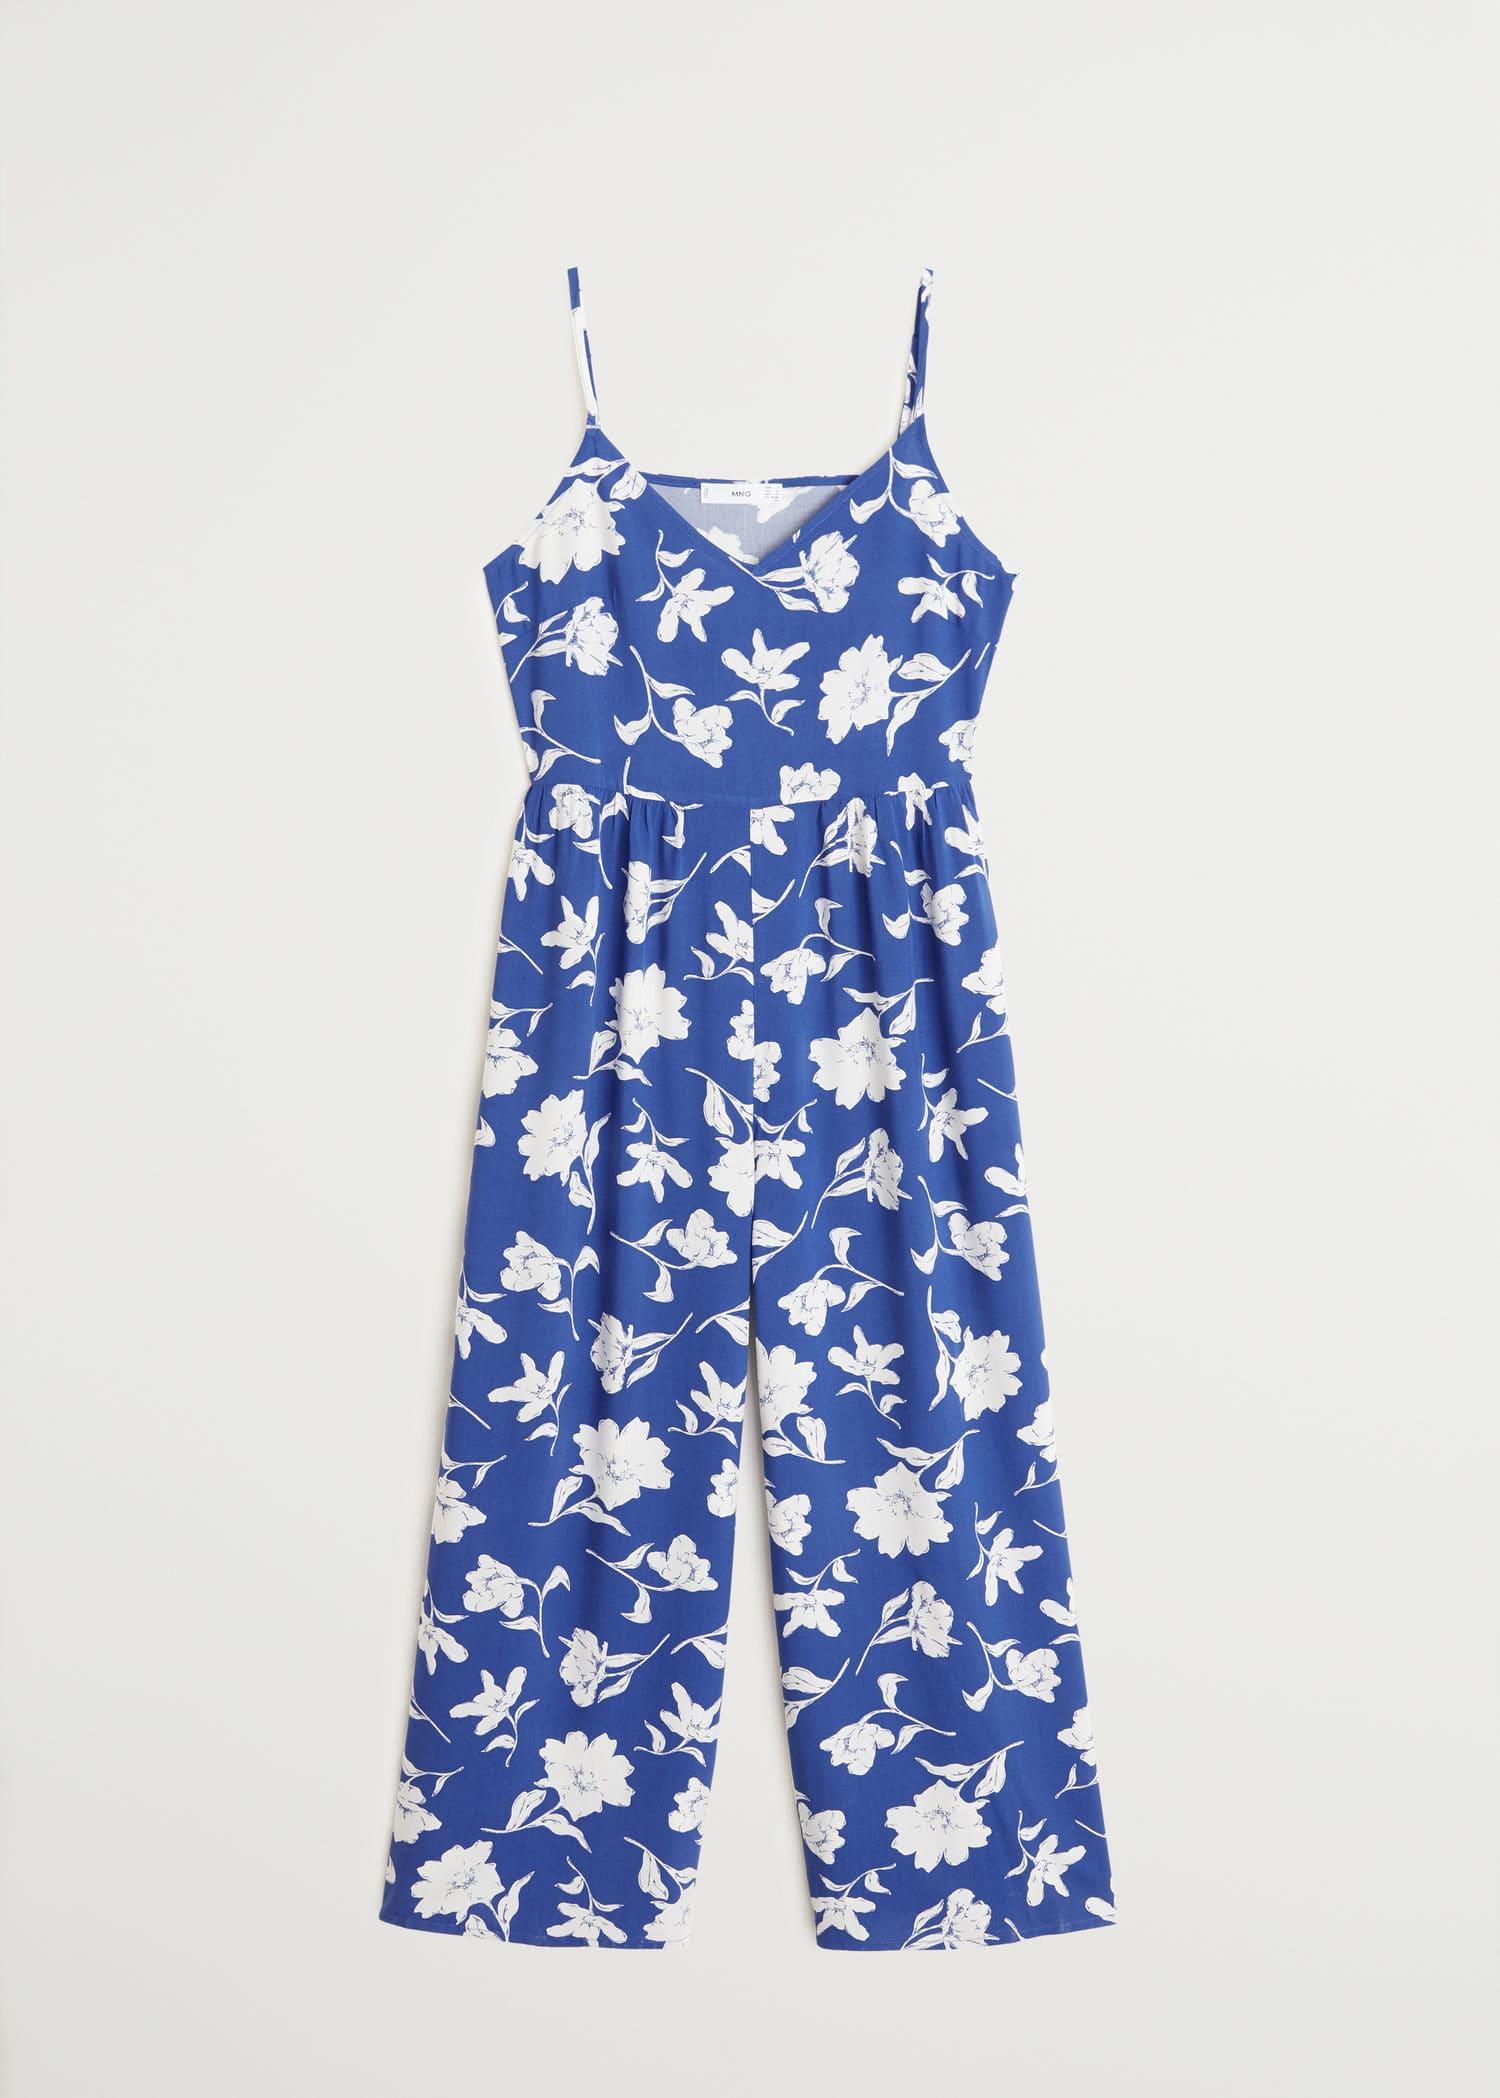 MANGO Casual Playsuit Blue Patterned Size XS,S,M,L